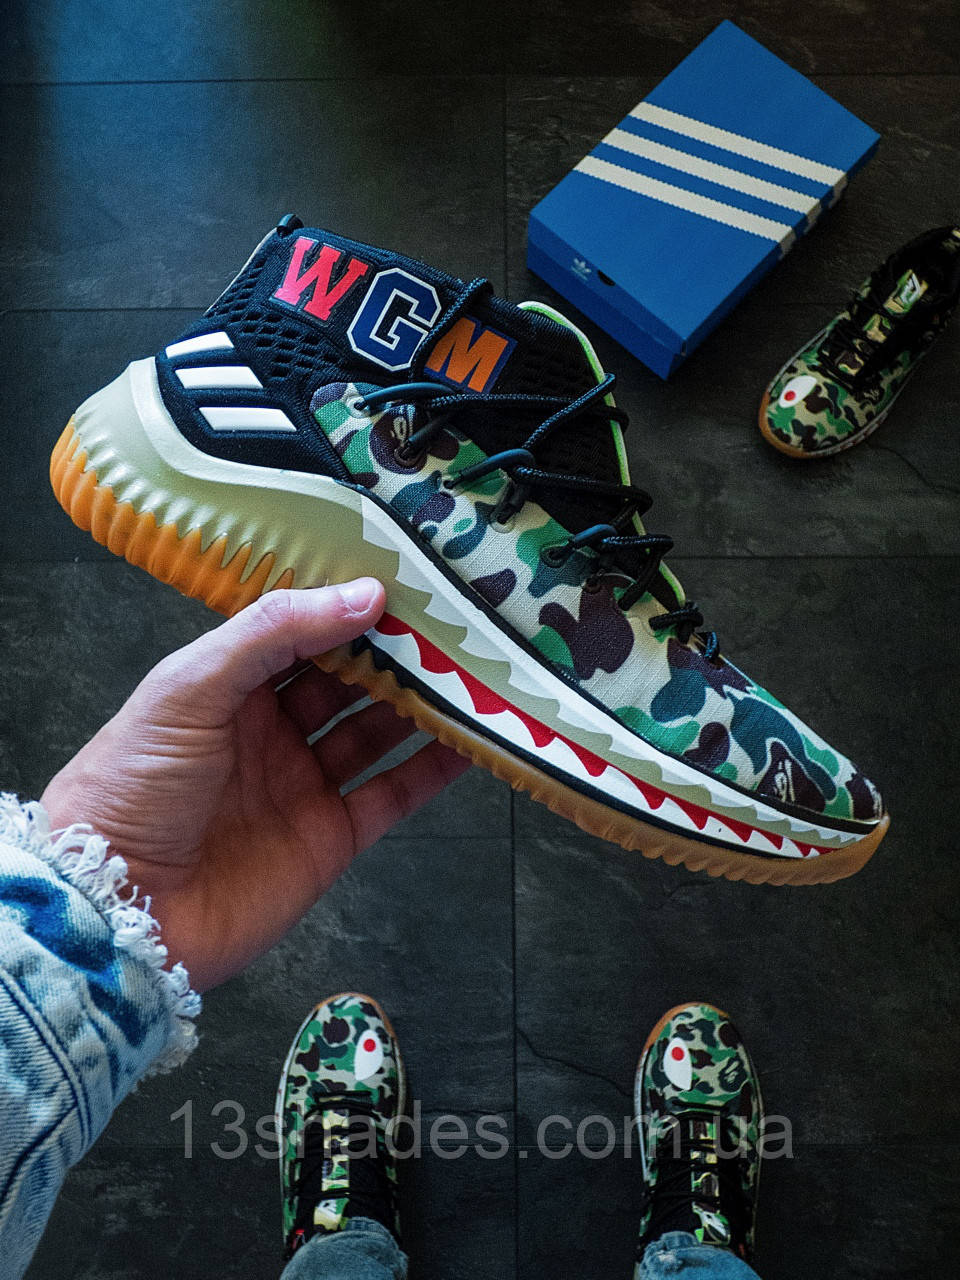 кроссовки мужские Adidas X Bape Dame 4 Camo Green продажа цена в